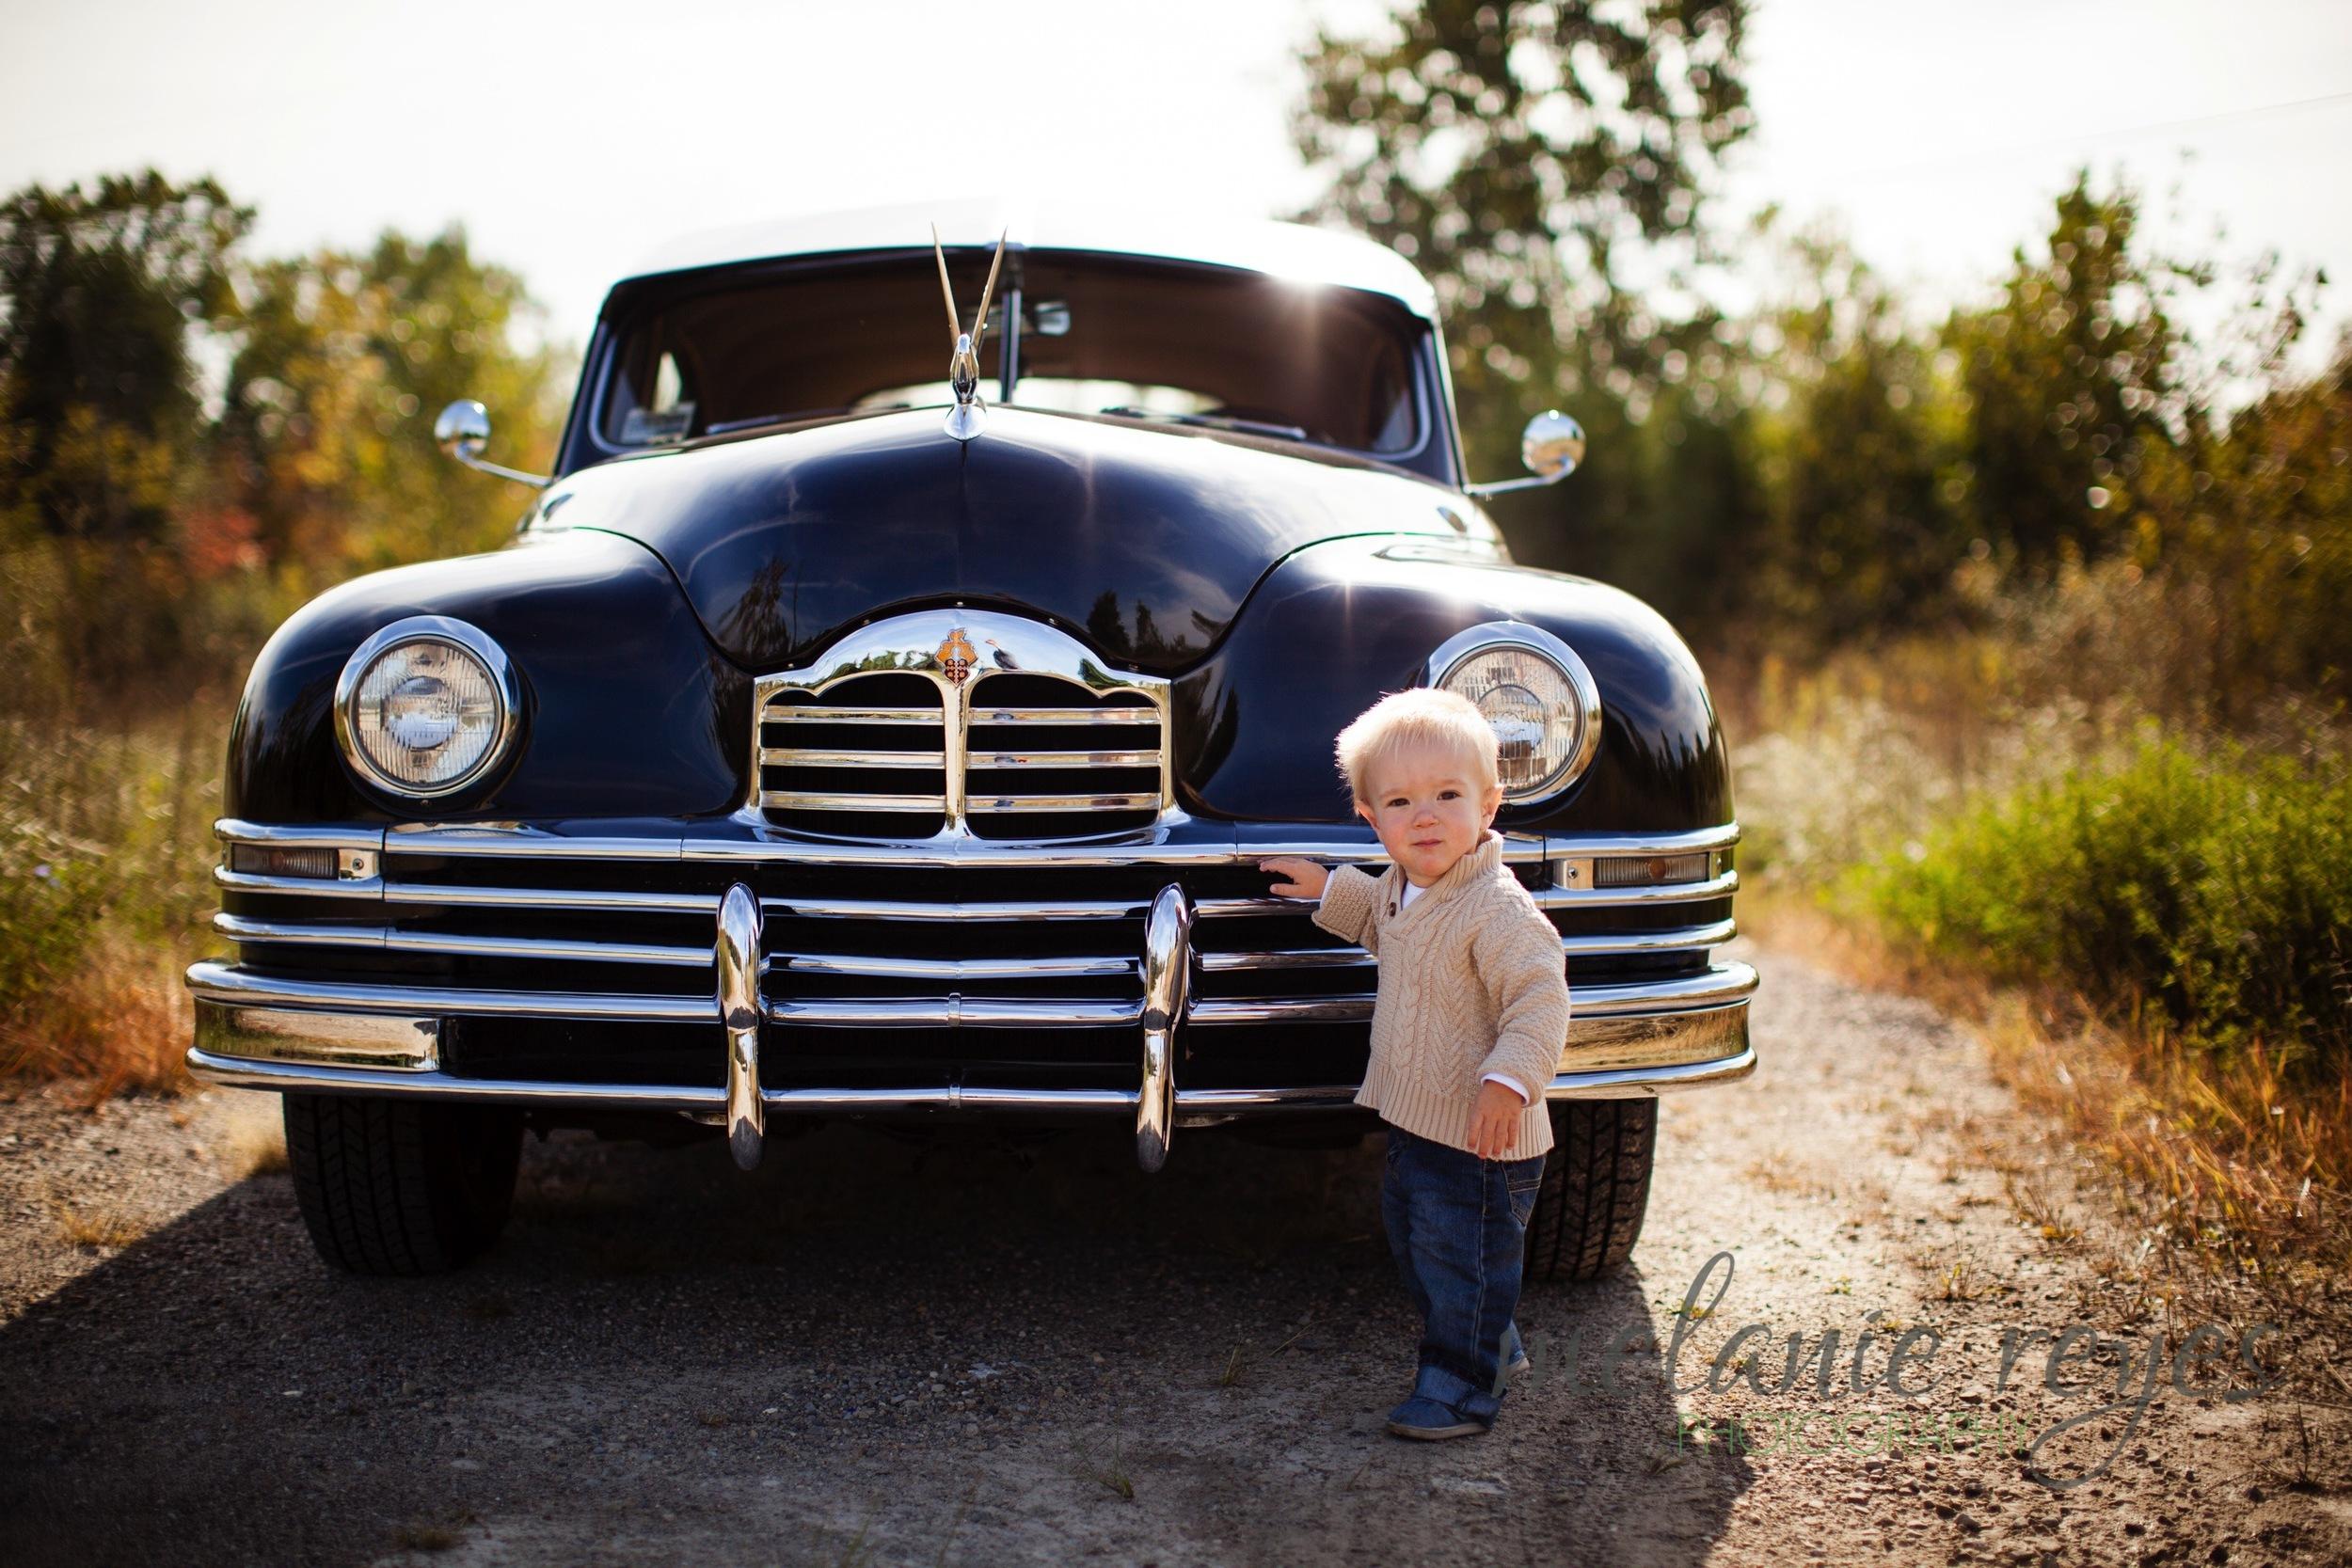 melanie_reyes_photography__motor_city_vintage_rentals_094